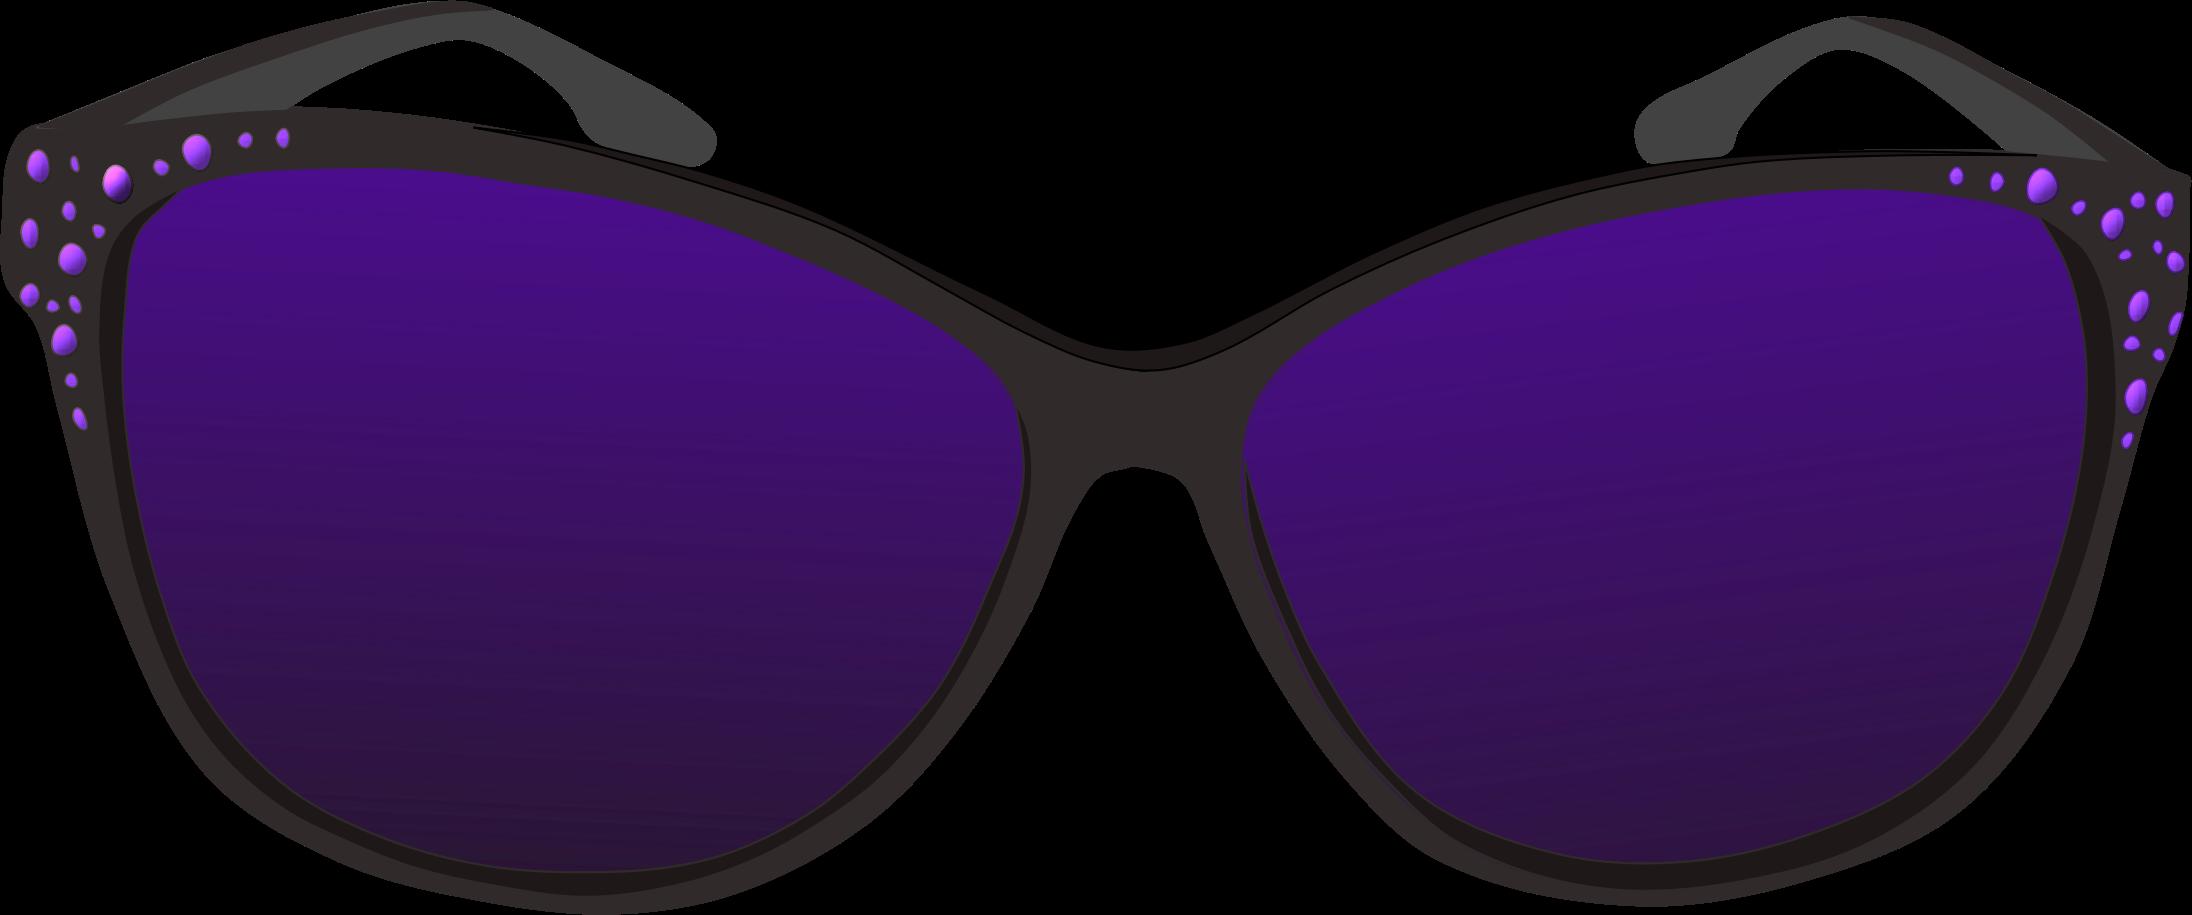 Blue sunglasses clipart louisiana bucket brigade